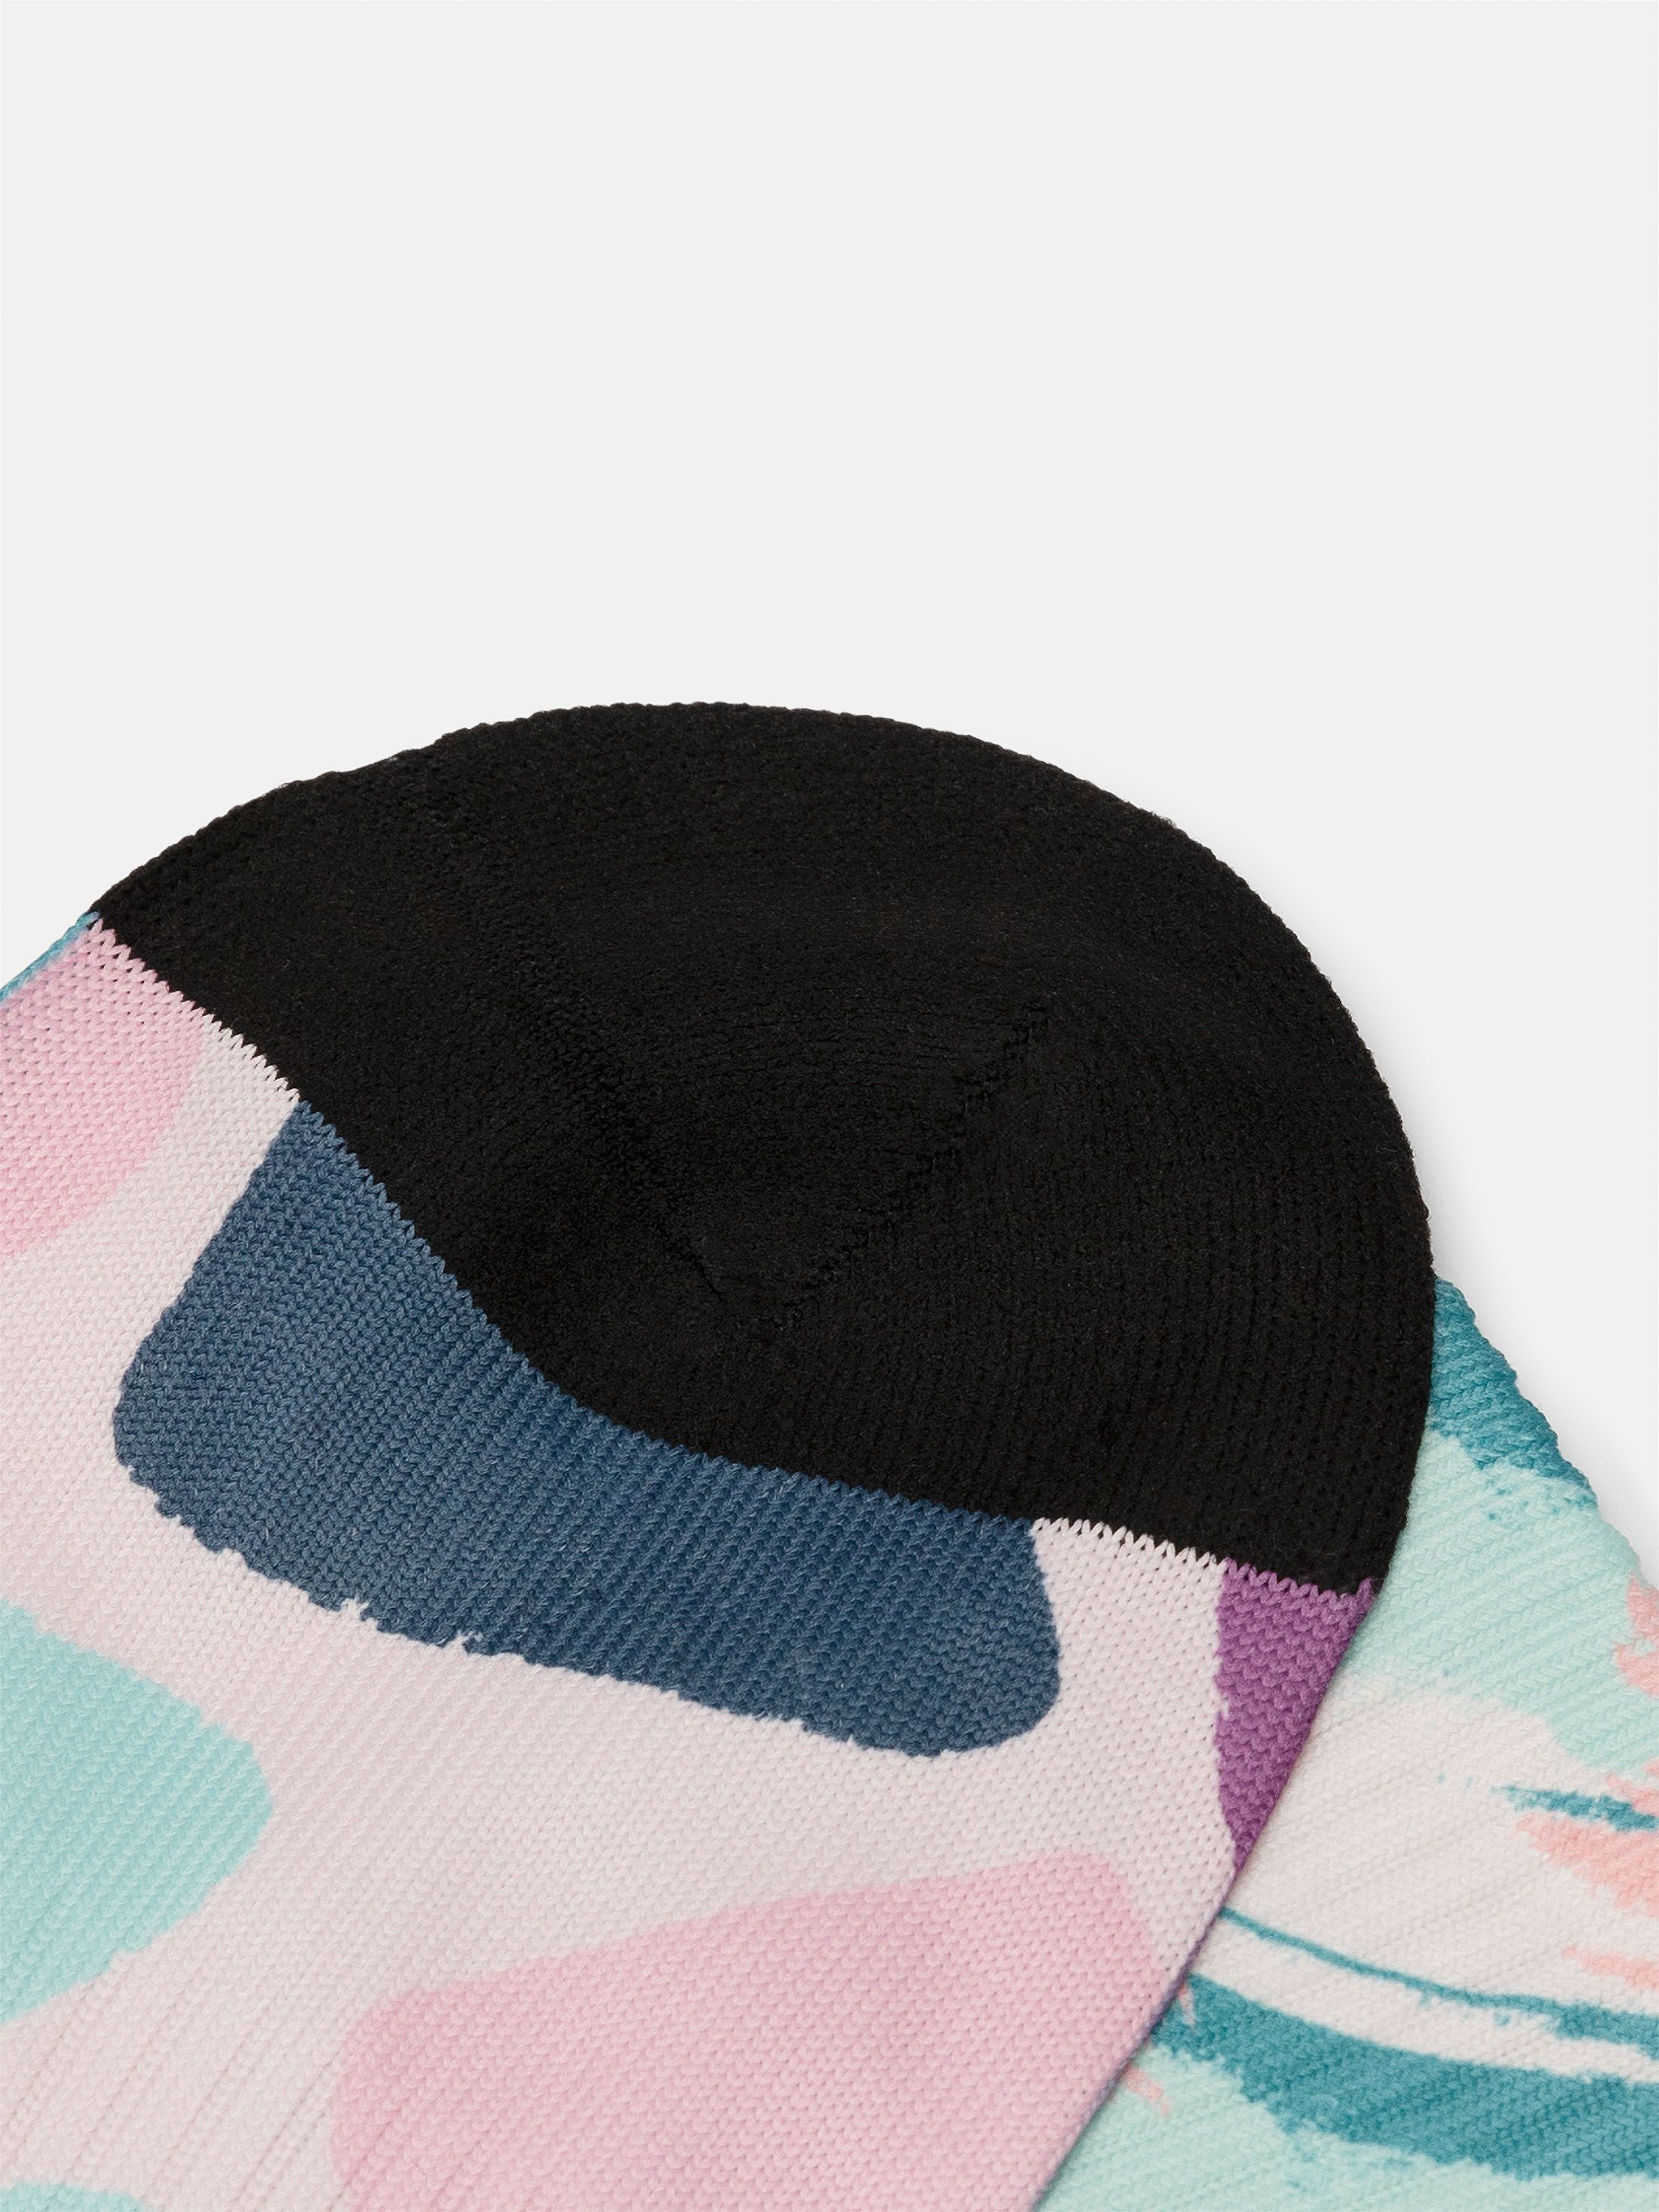 custom printed socks visible line